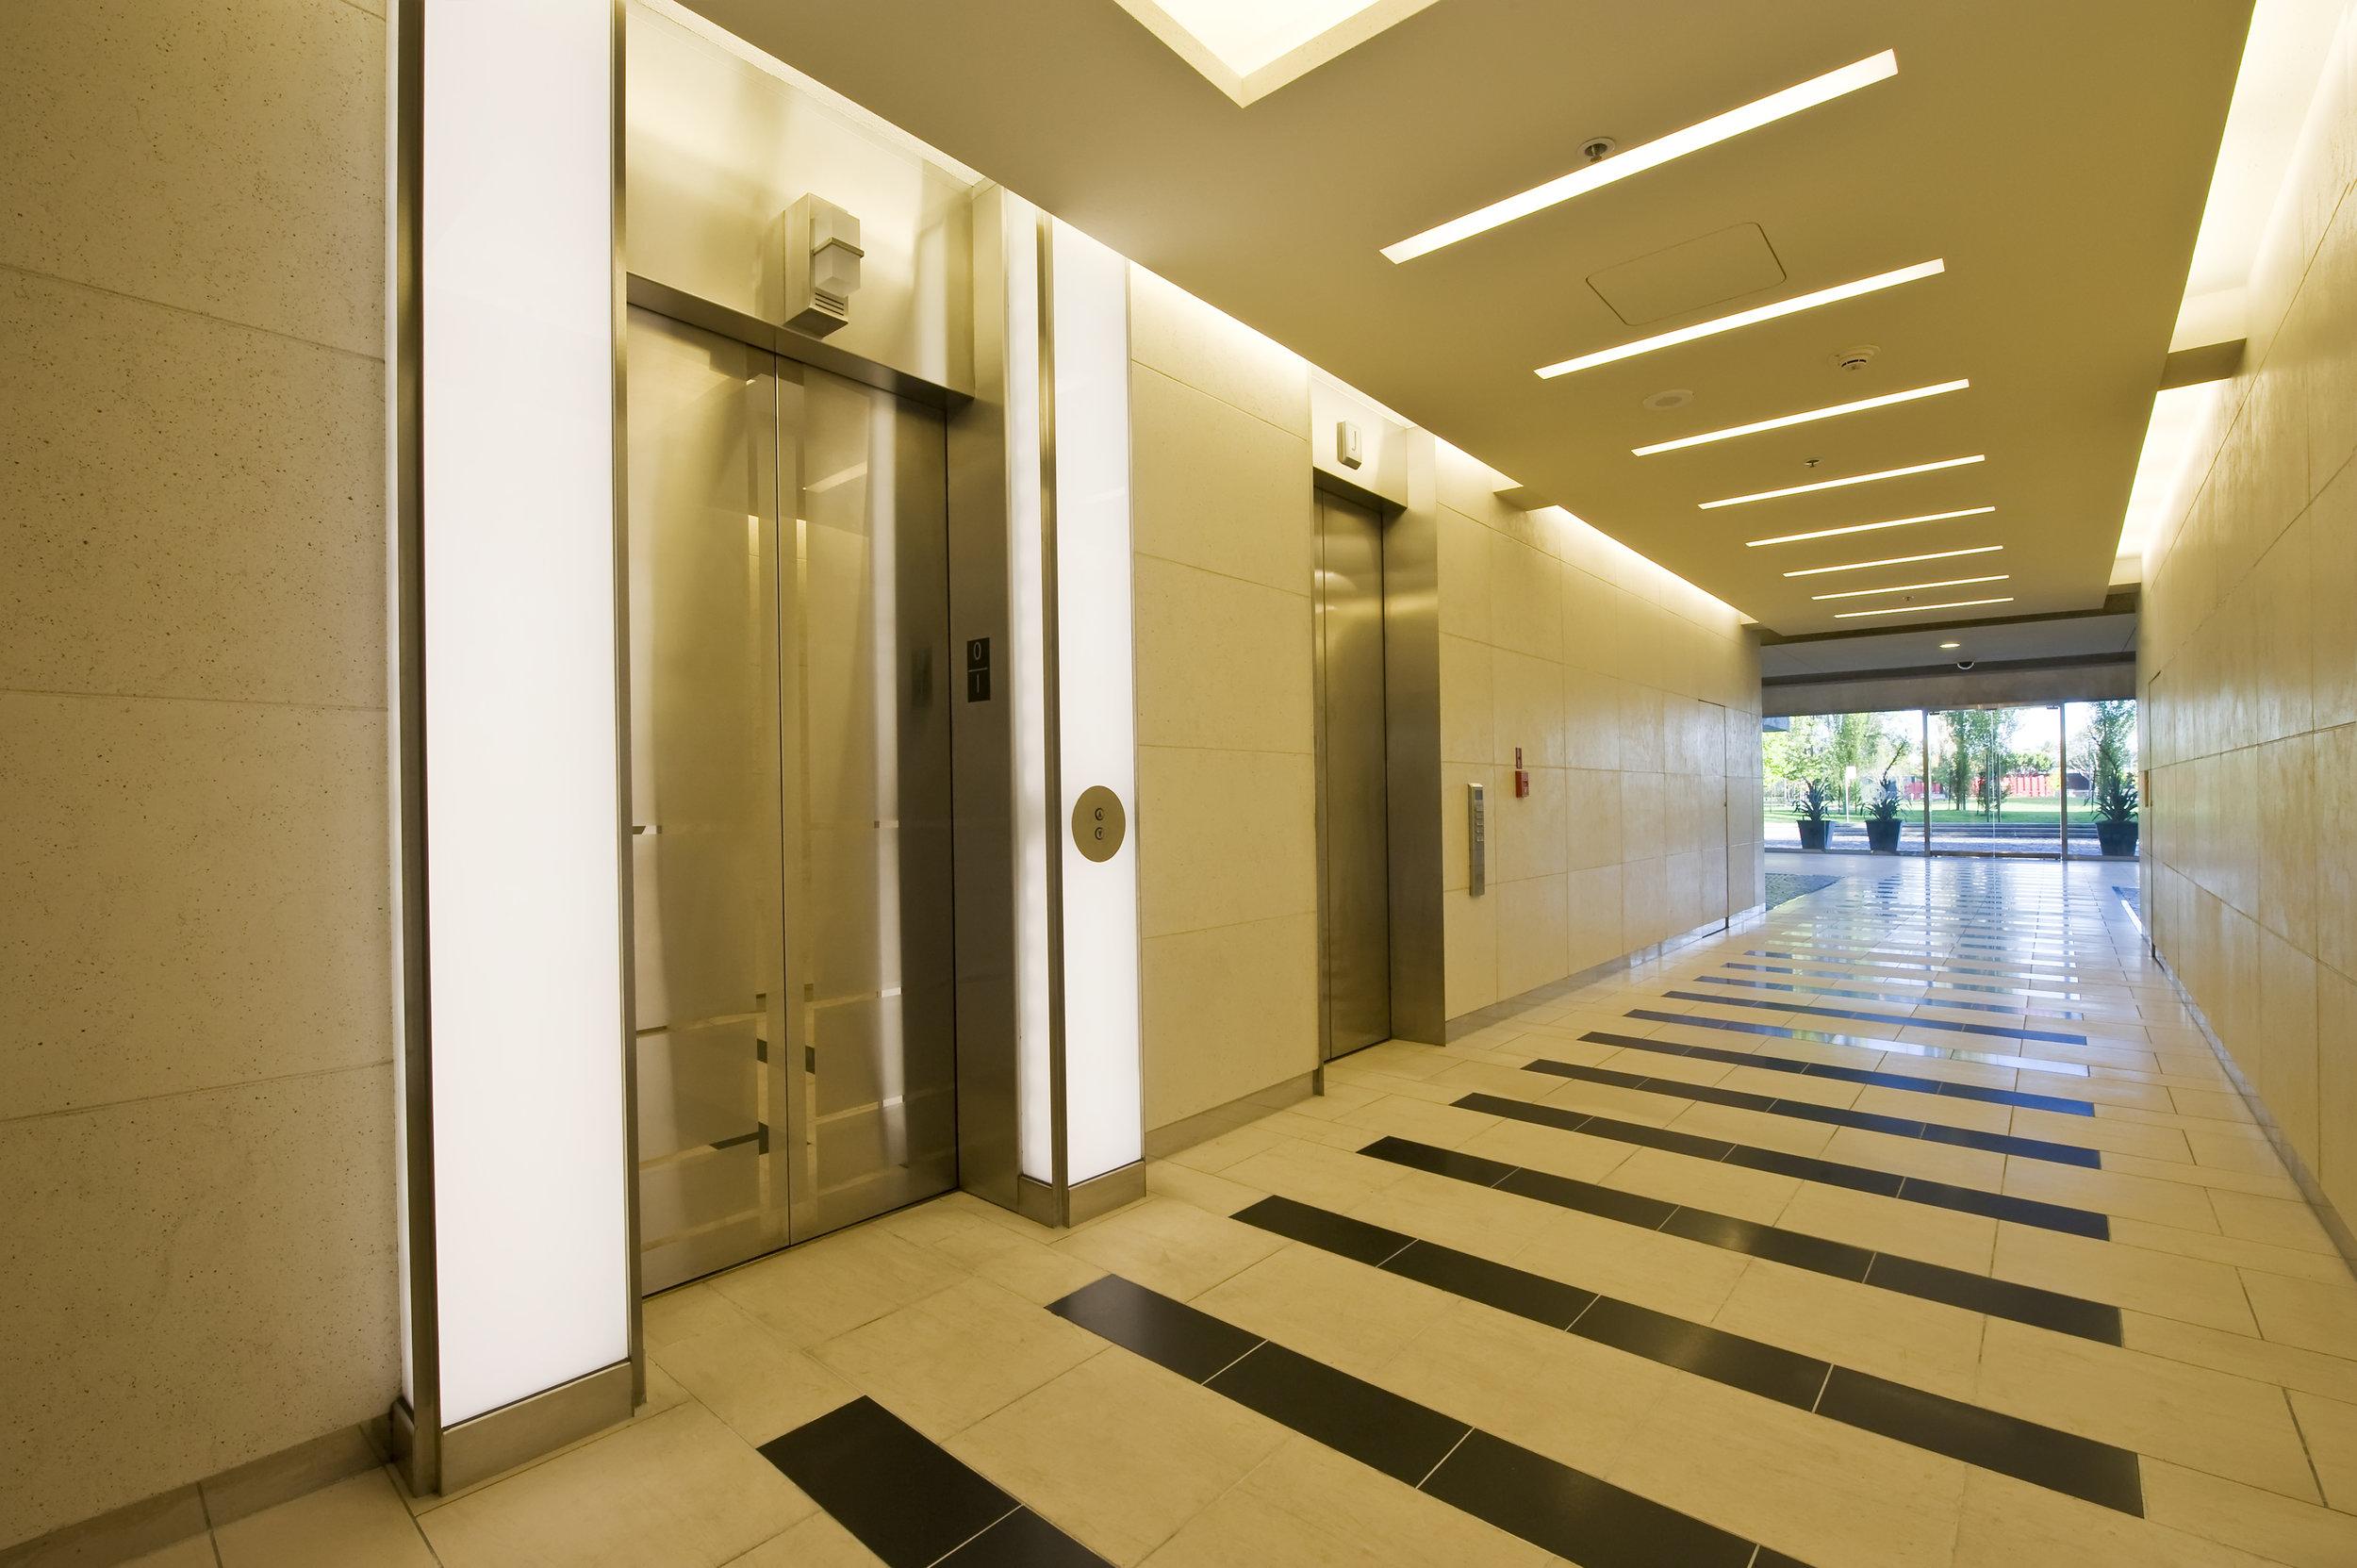 4 EC Elevator Hall.jpg